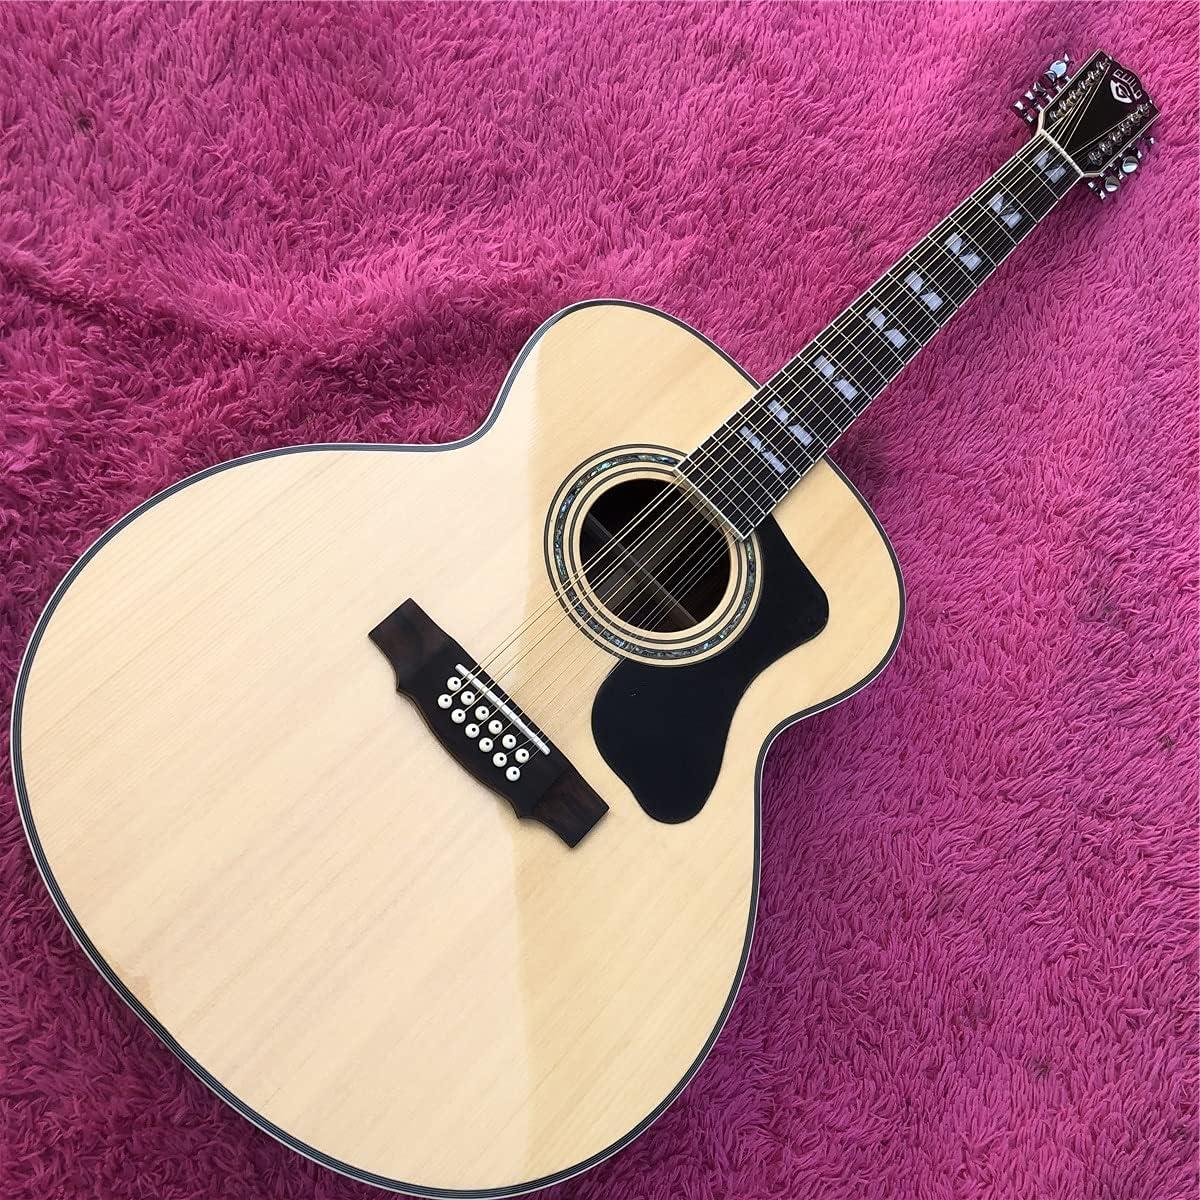 Guitarra 12 Cuerdas Solid A Spruce Top F50 Guitarra Acústica Aceptó 43 Pulgadas Guild Electric Guitarra Guitarra de Madera AMINÍ (Size : 43 Inches)